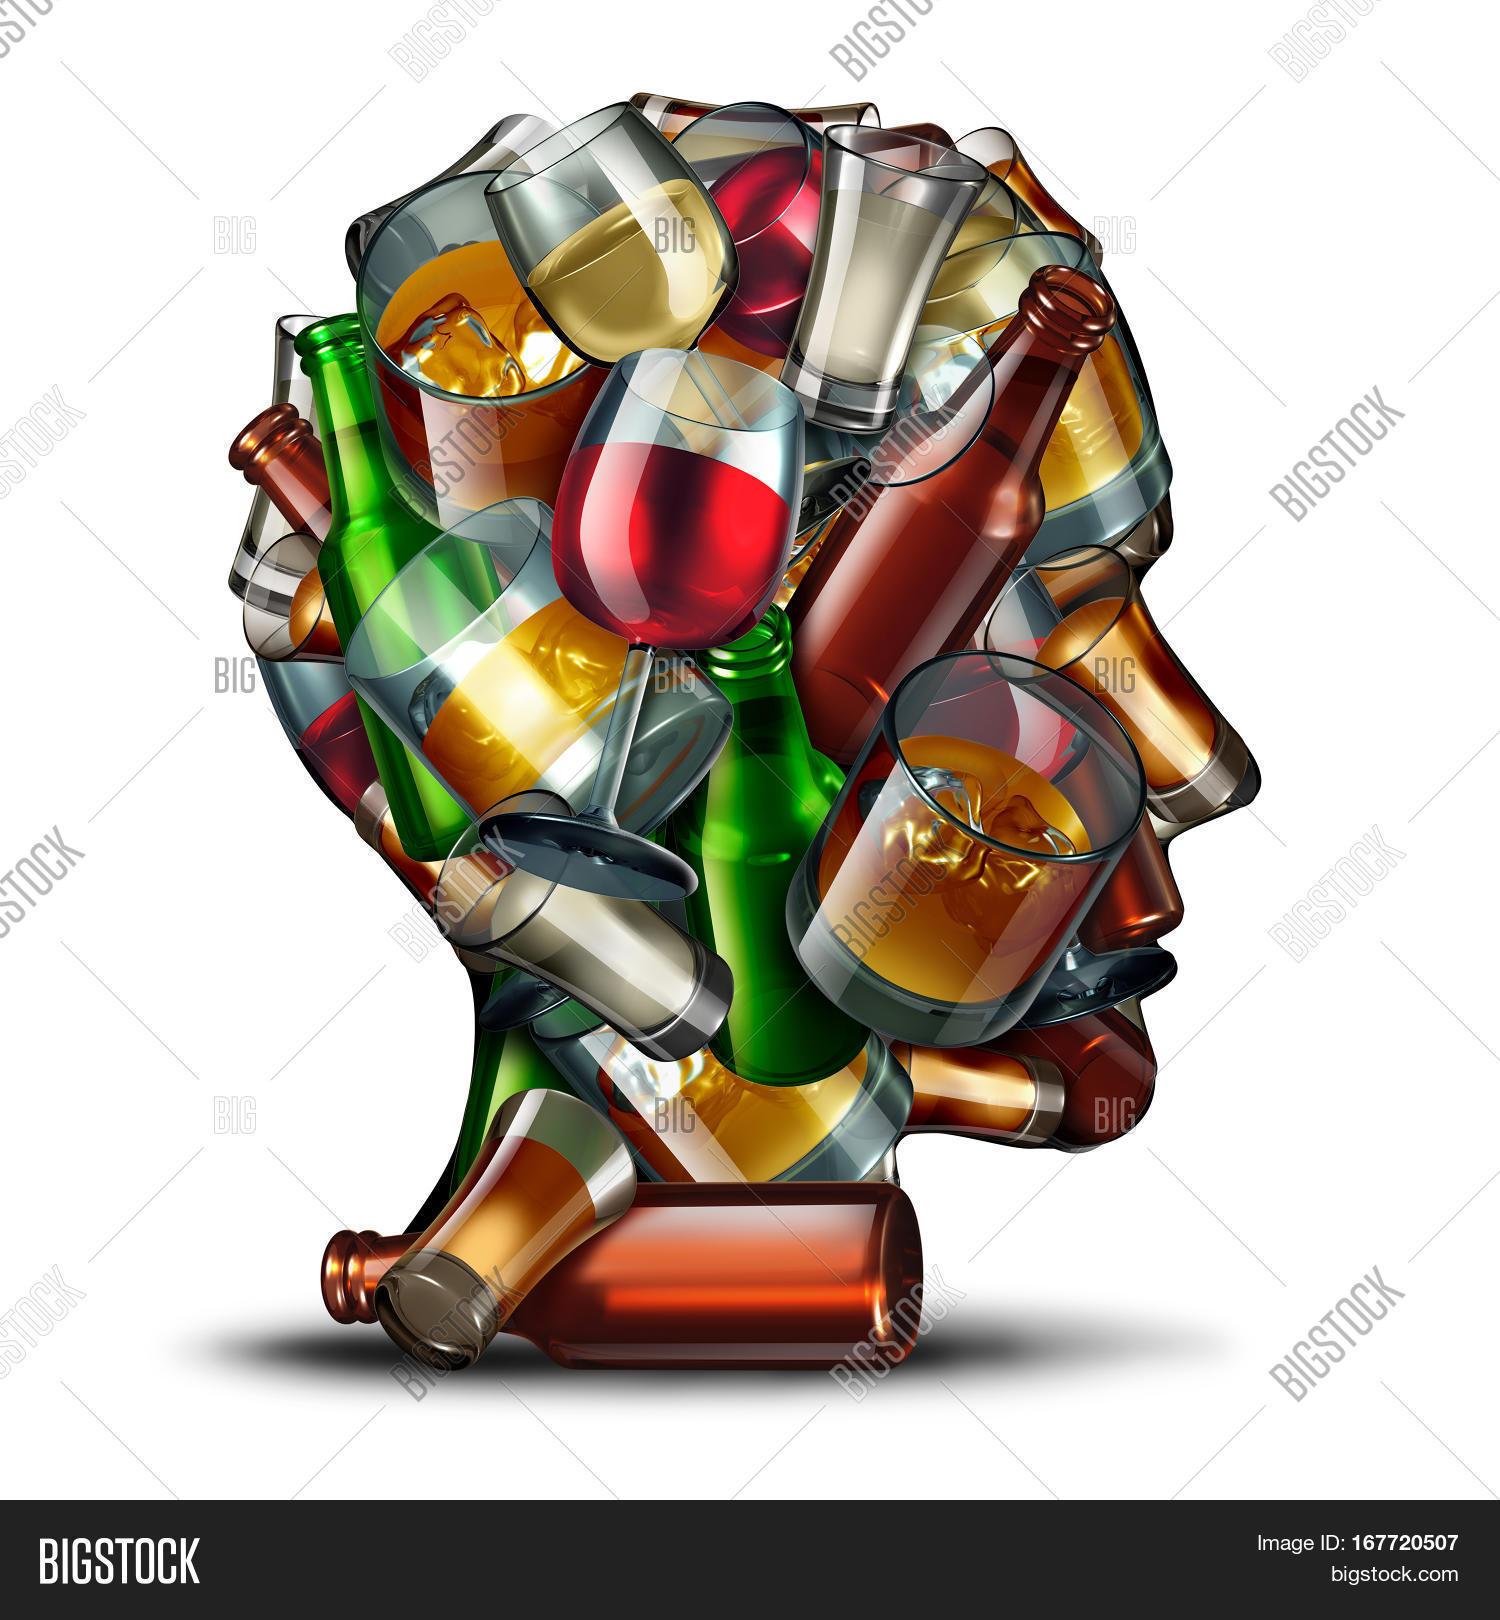 Alcohol psychology alcoholism image photo bigstock alcohol psychology and alcoholism concept as a group of beer wine and hard liquor glasses shaped buycottarizona